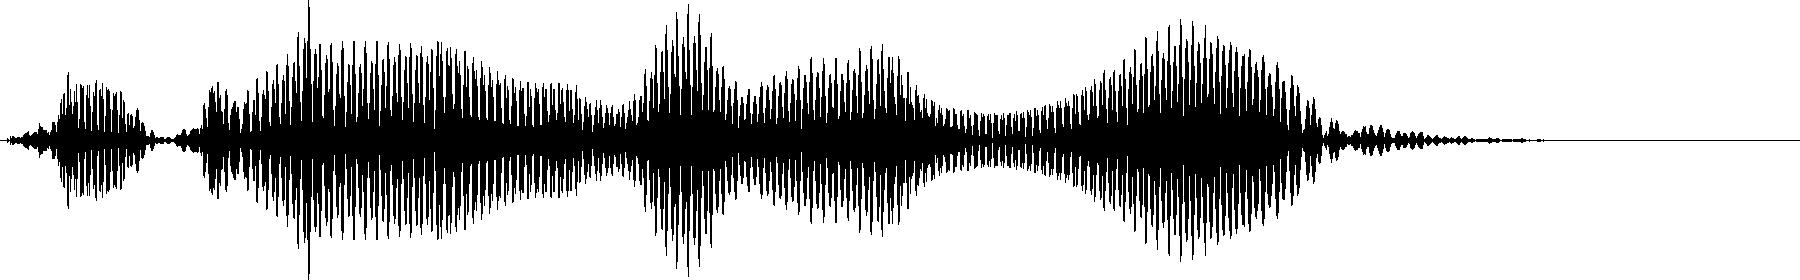 alvinspk26